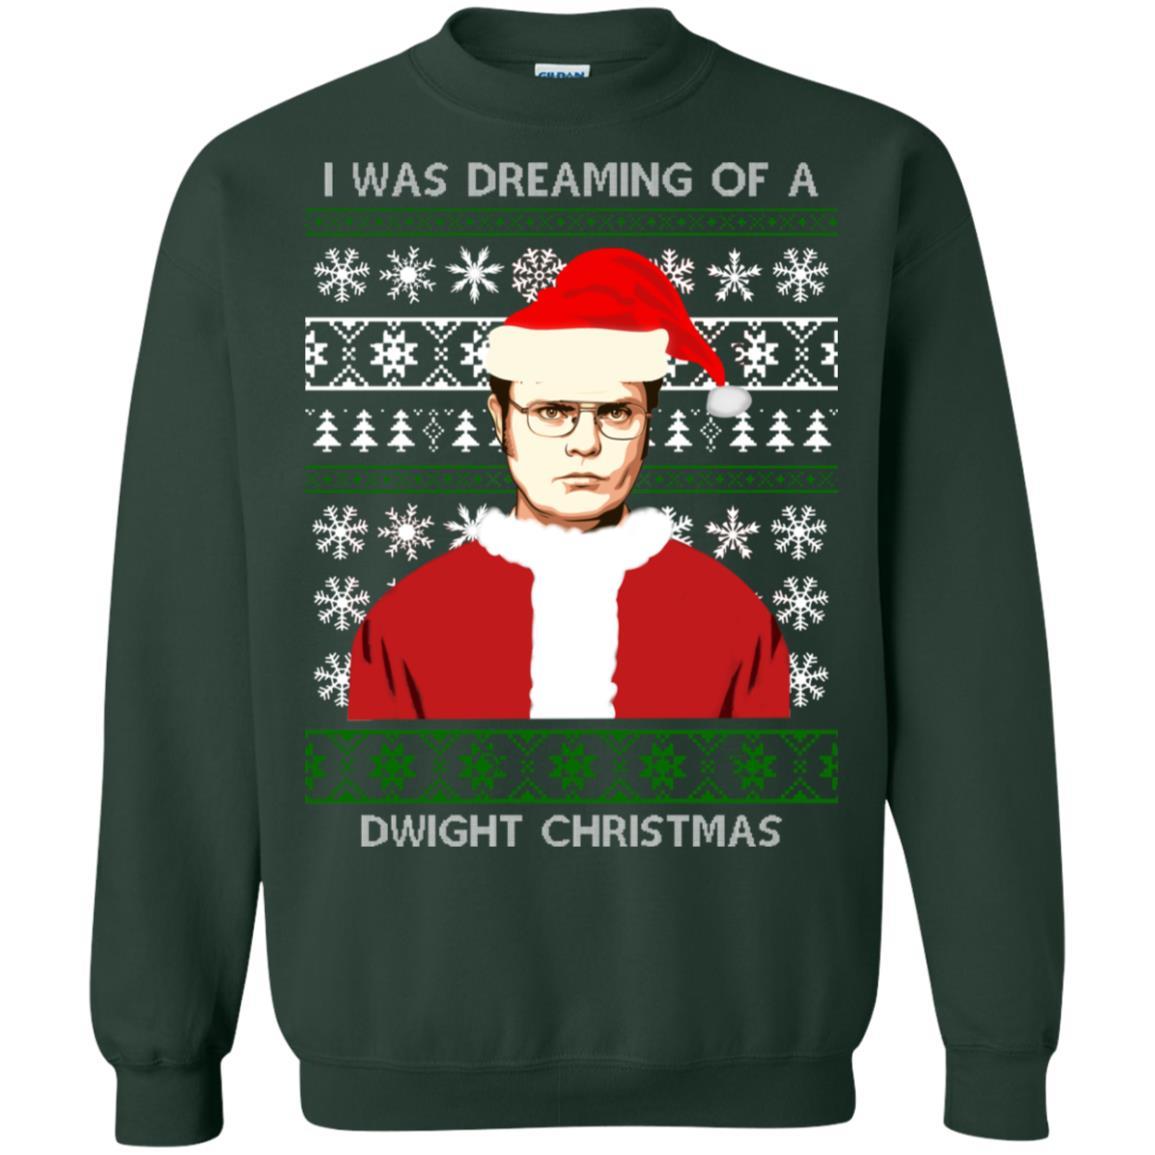 Dwight Christmas.I M Dreaming Of A Dwight Christmas Sweatshirt